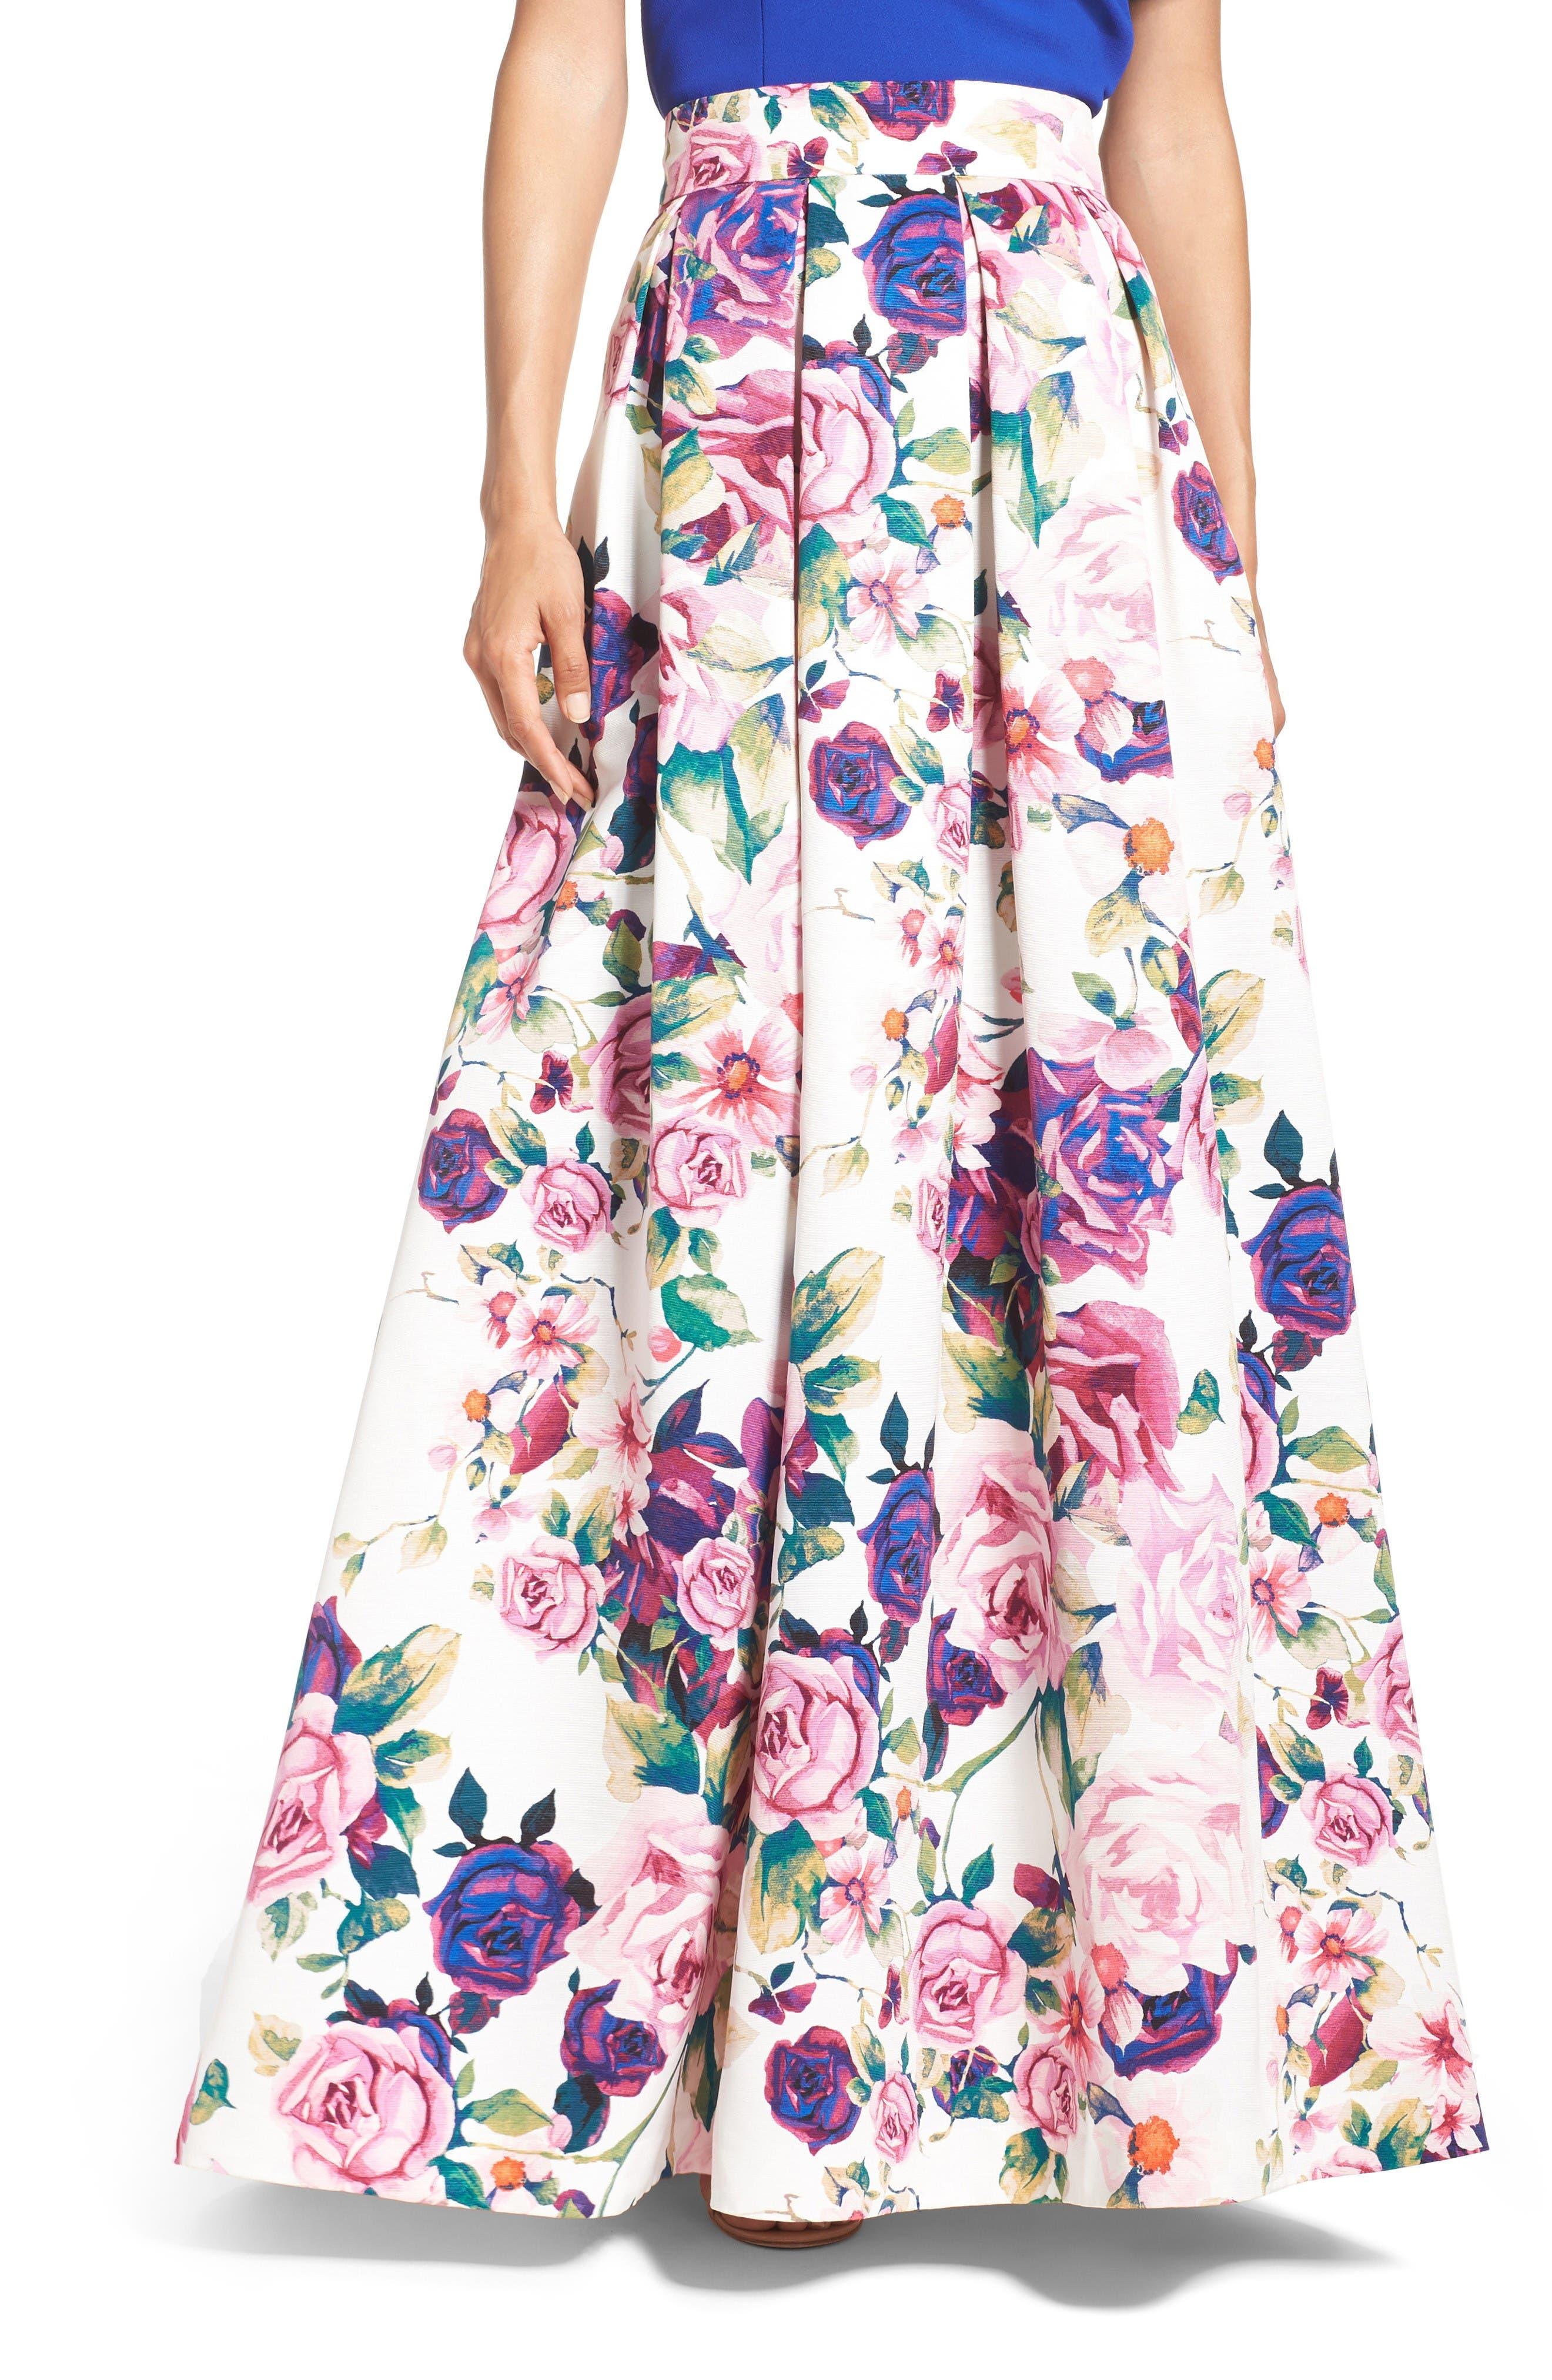 Eliza J Floral Print Ball Skirt